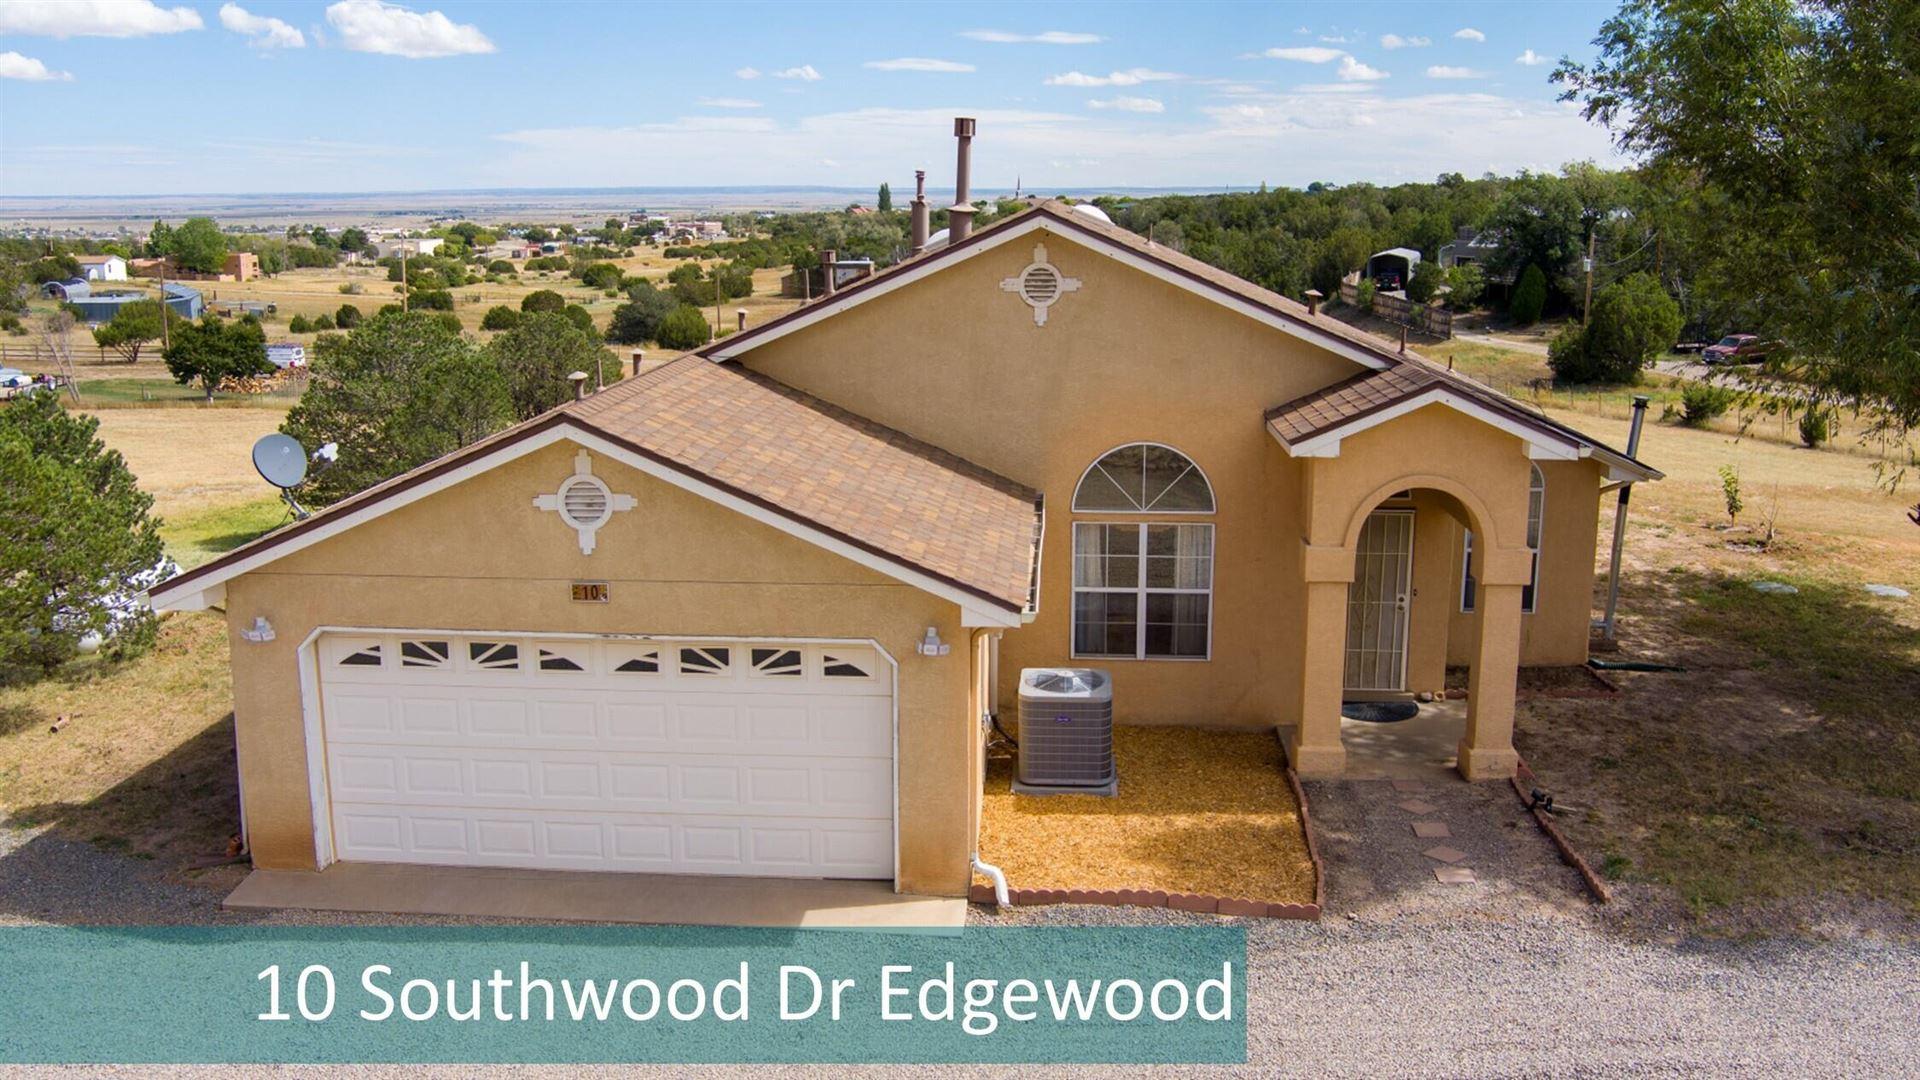 10 SOUTHWOOD Drive, Edgewood, NM 87015 - #: 1001962